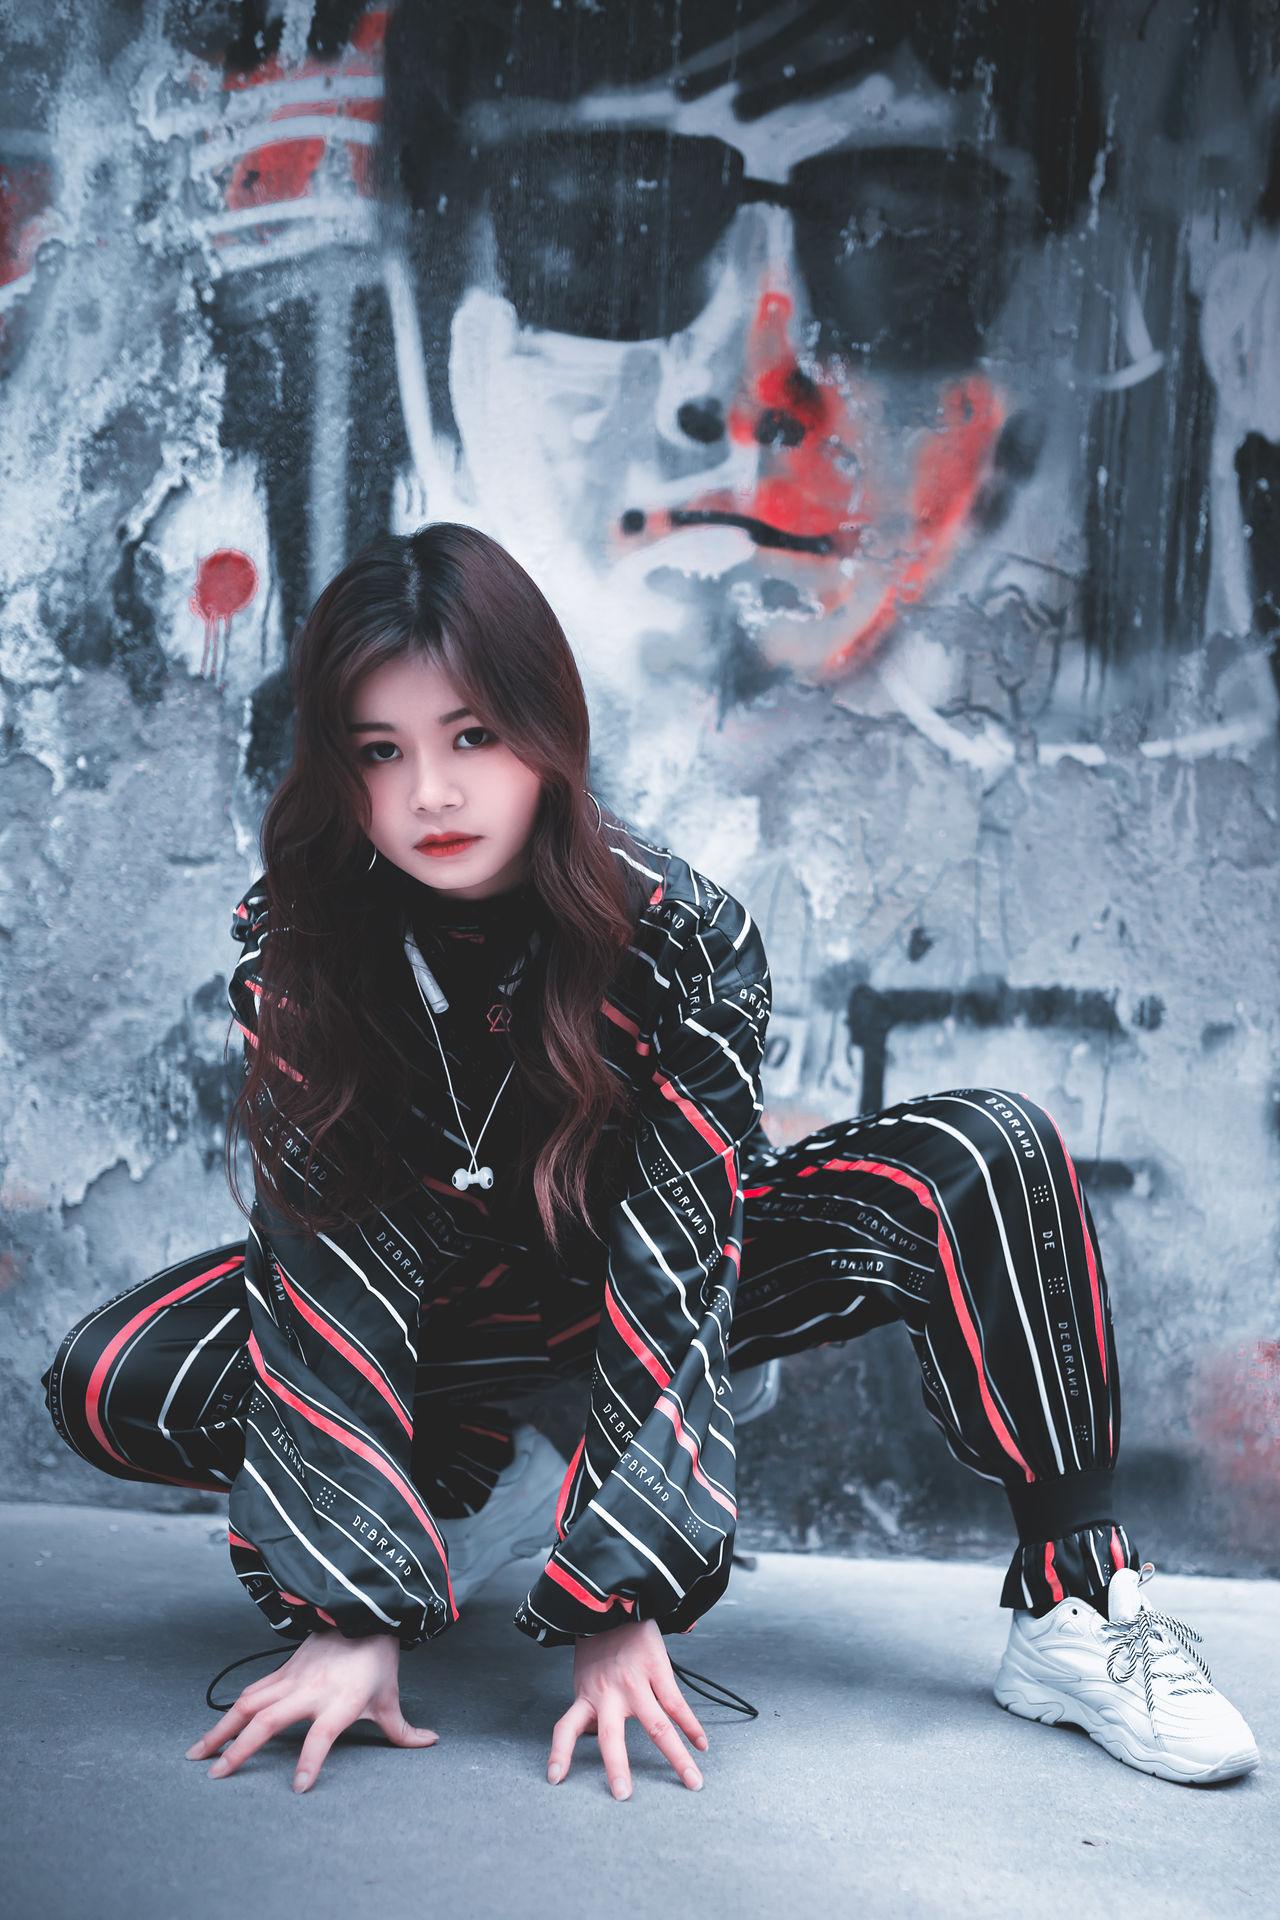 2019-01-26 M50_摄影师江南小生的返片